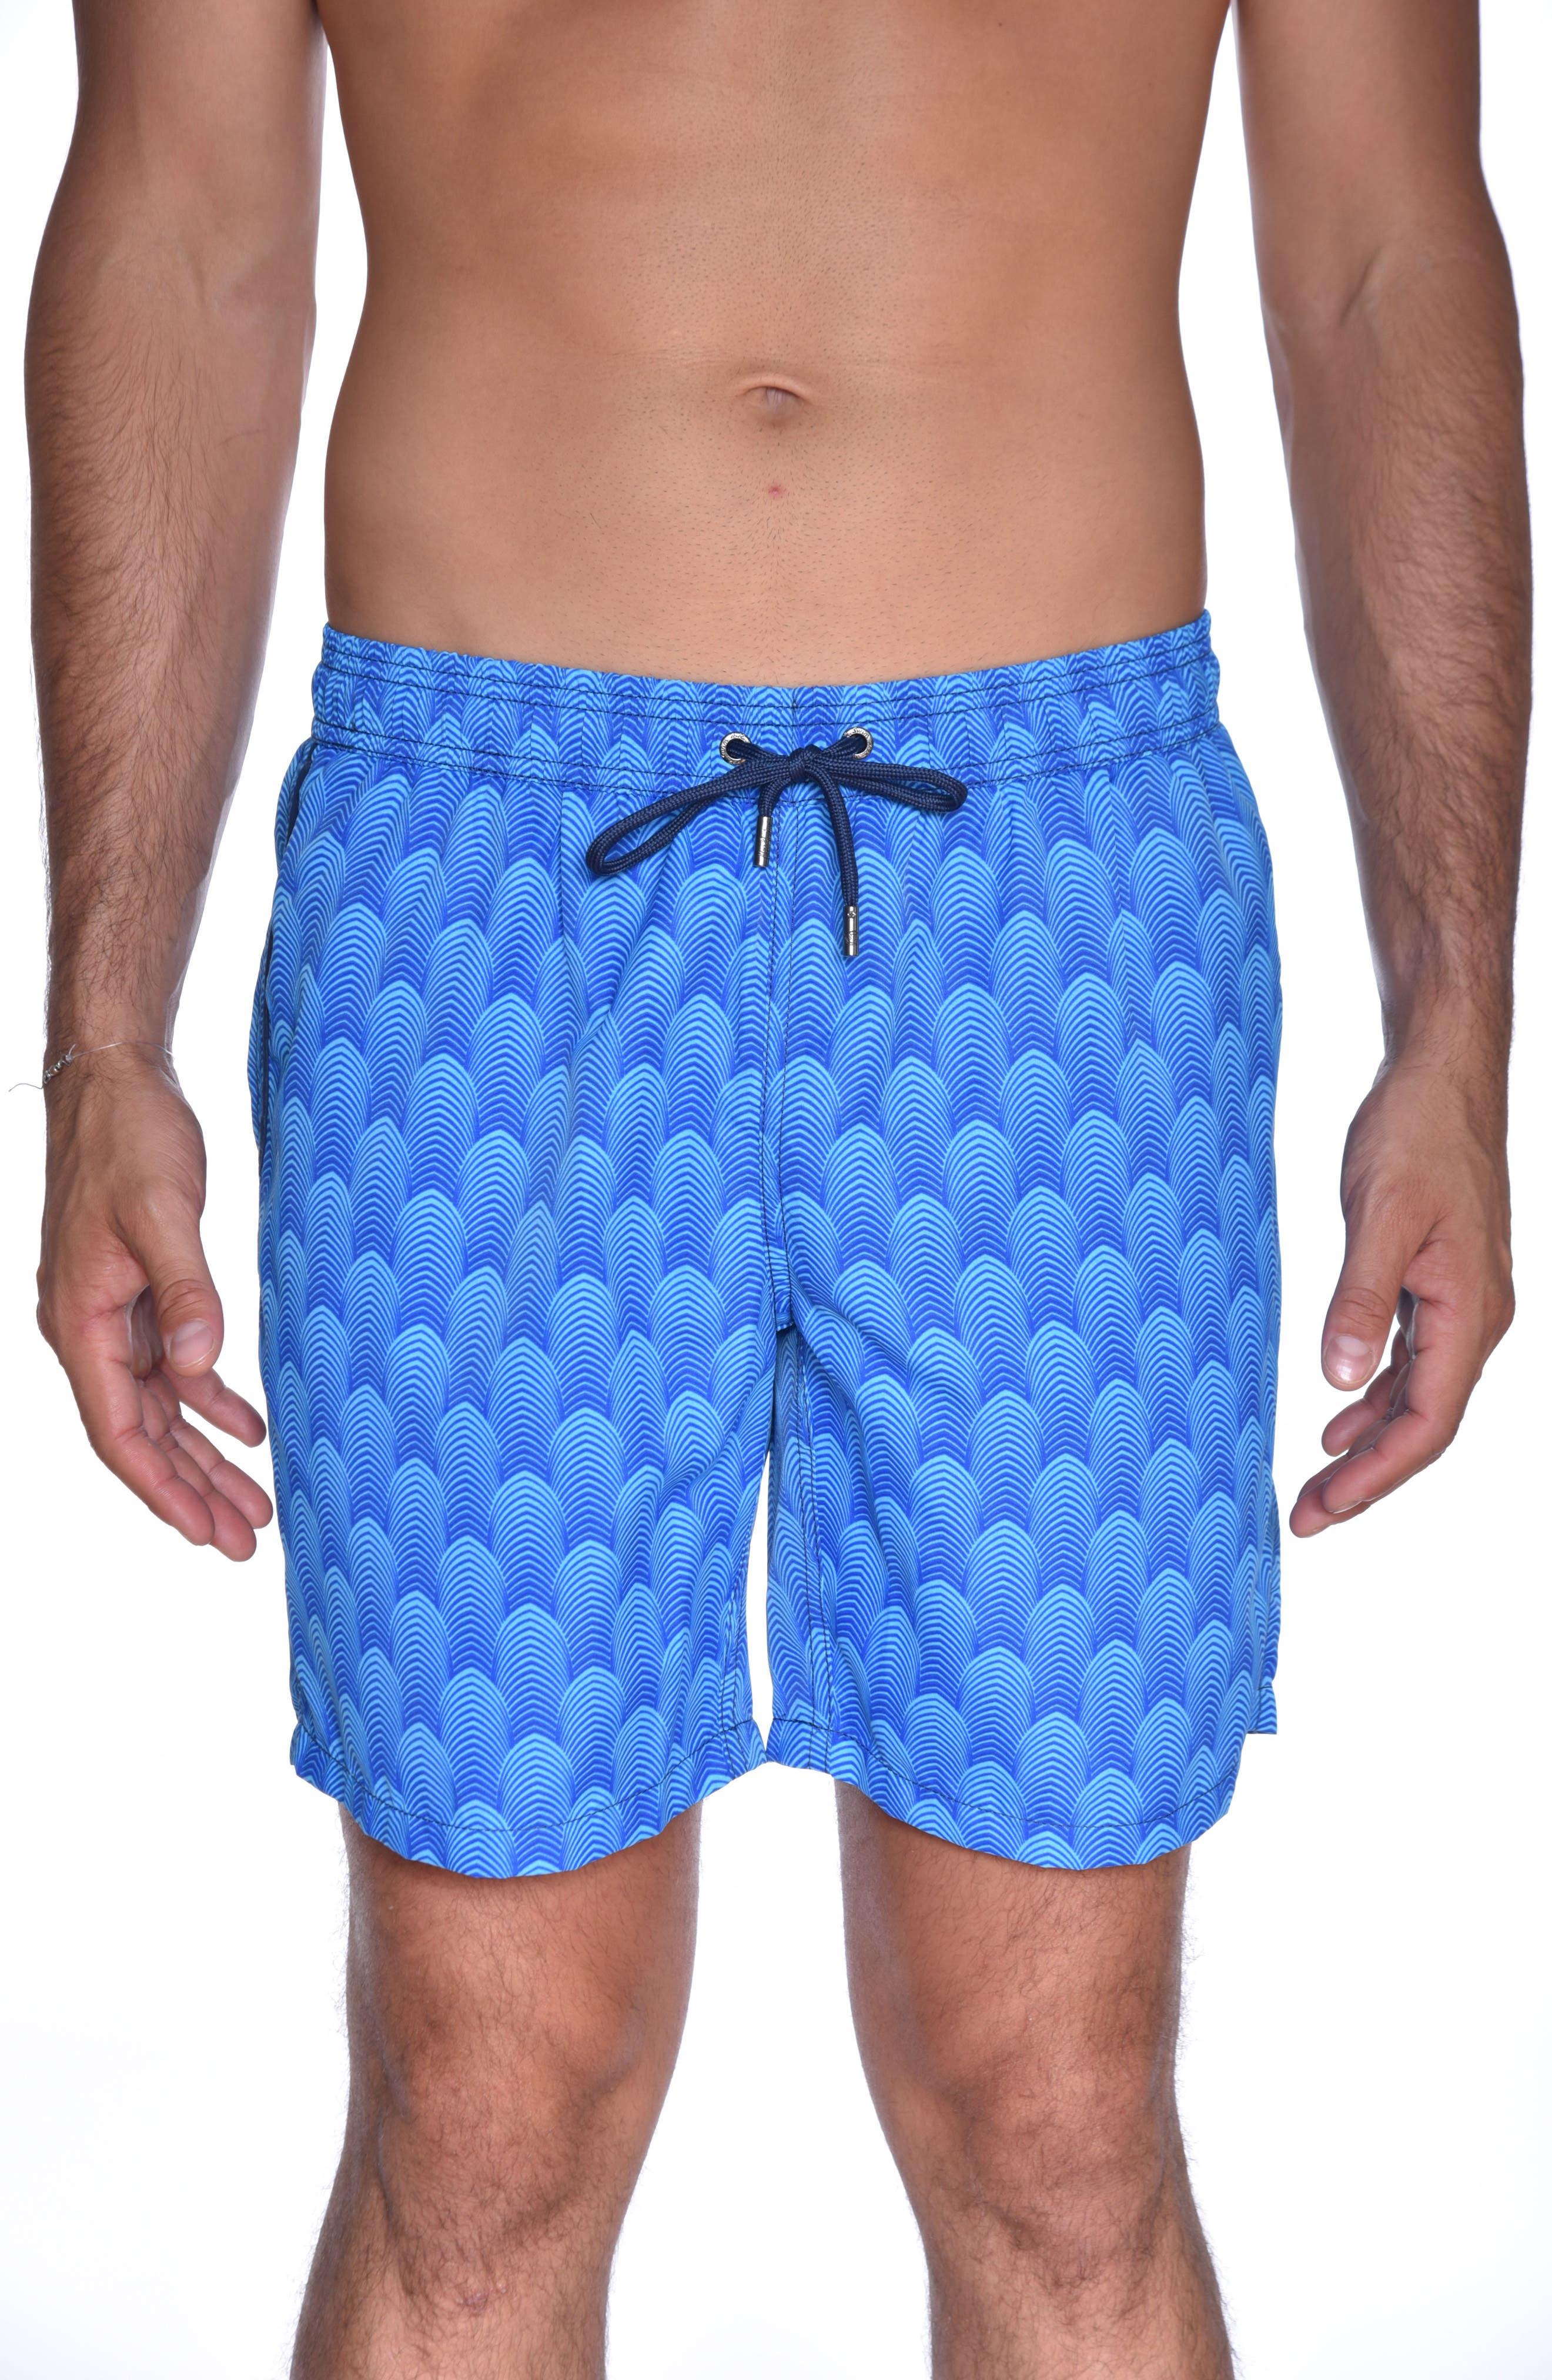 Mr. Swim Deco Print Swim Trunks,                         Main,                         color, Aqua